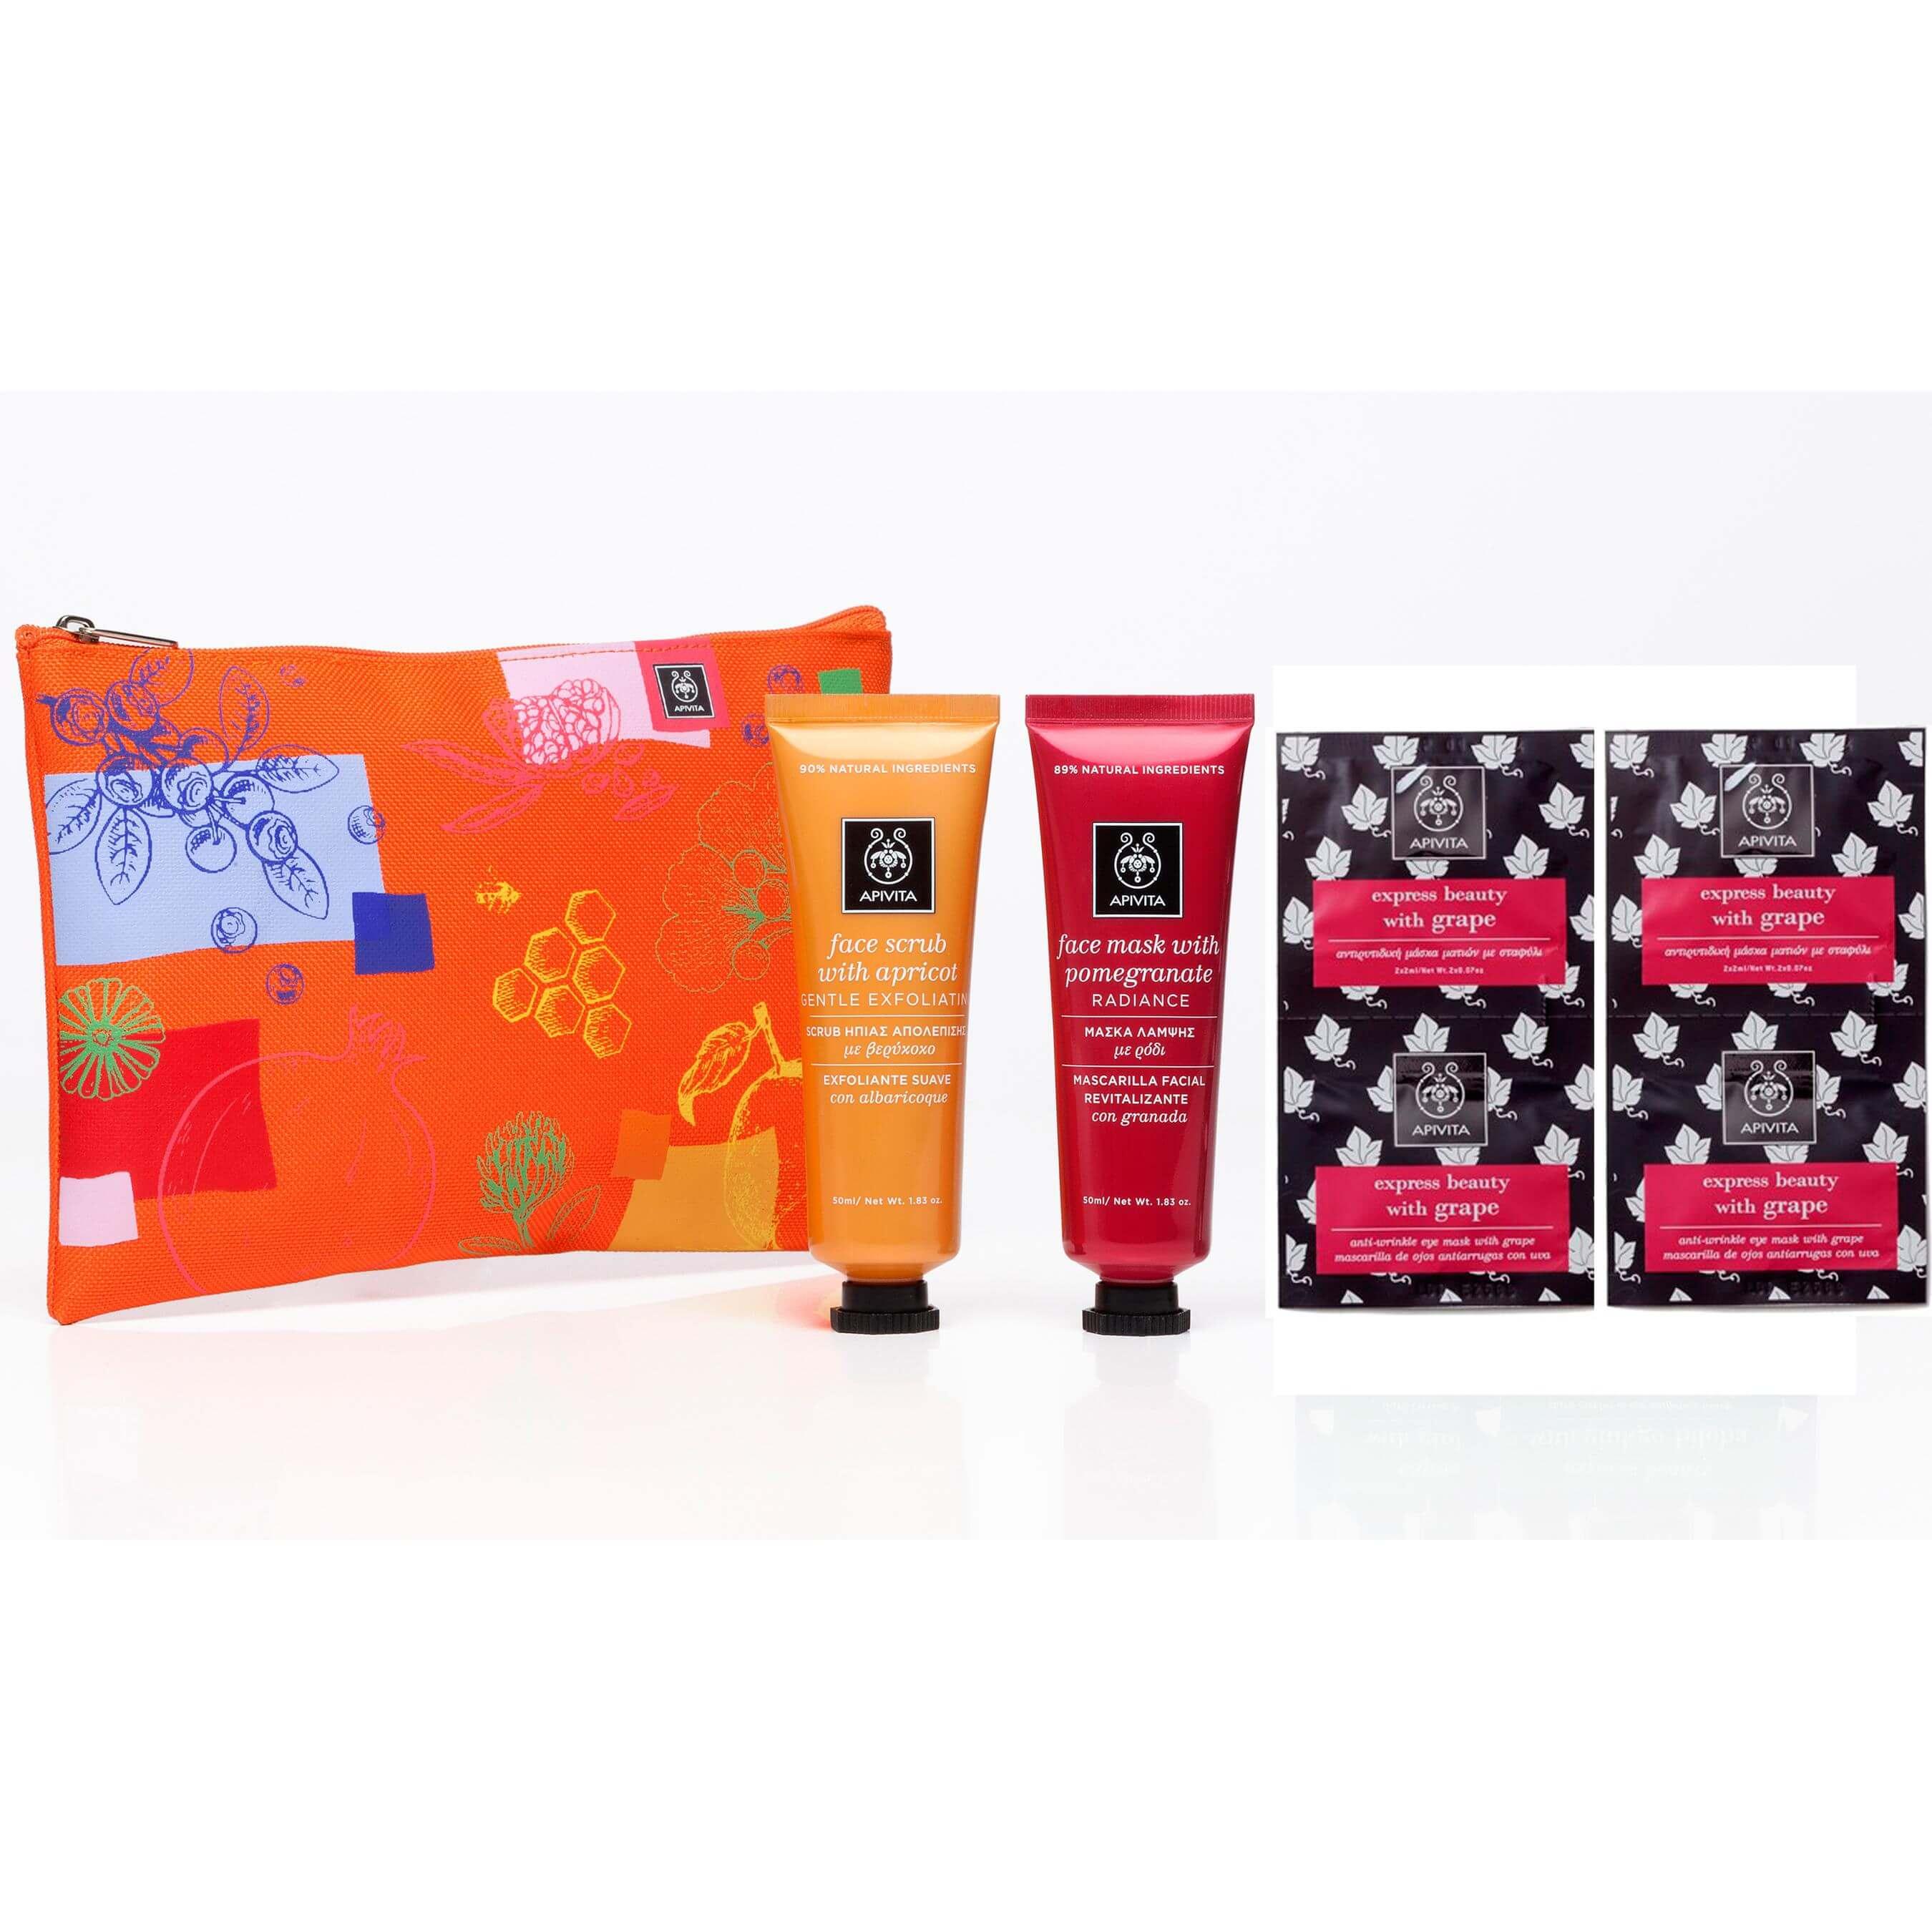 Apivita Gift Set Scrub Απολέπισης Βερίκοκο 50ml, Μάσκα Λάμψης Ρόδι 50ml &Δώρο Αντιρυτιδική Μάσκα Ματιών Σταφύλι 2x2ml Νεσεσερ